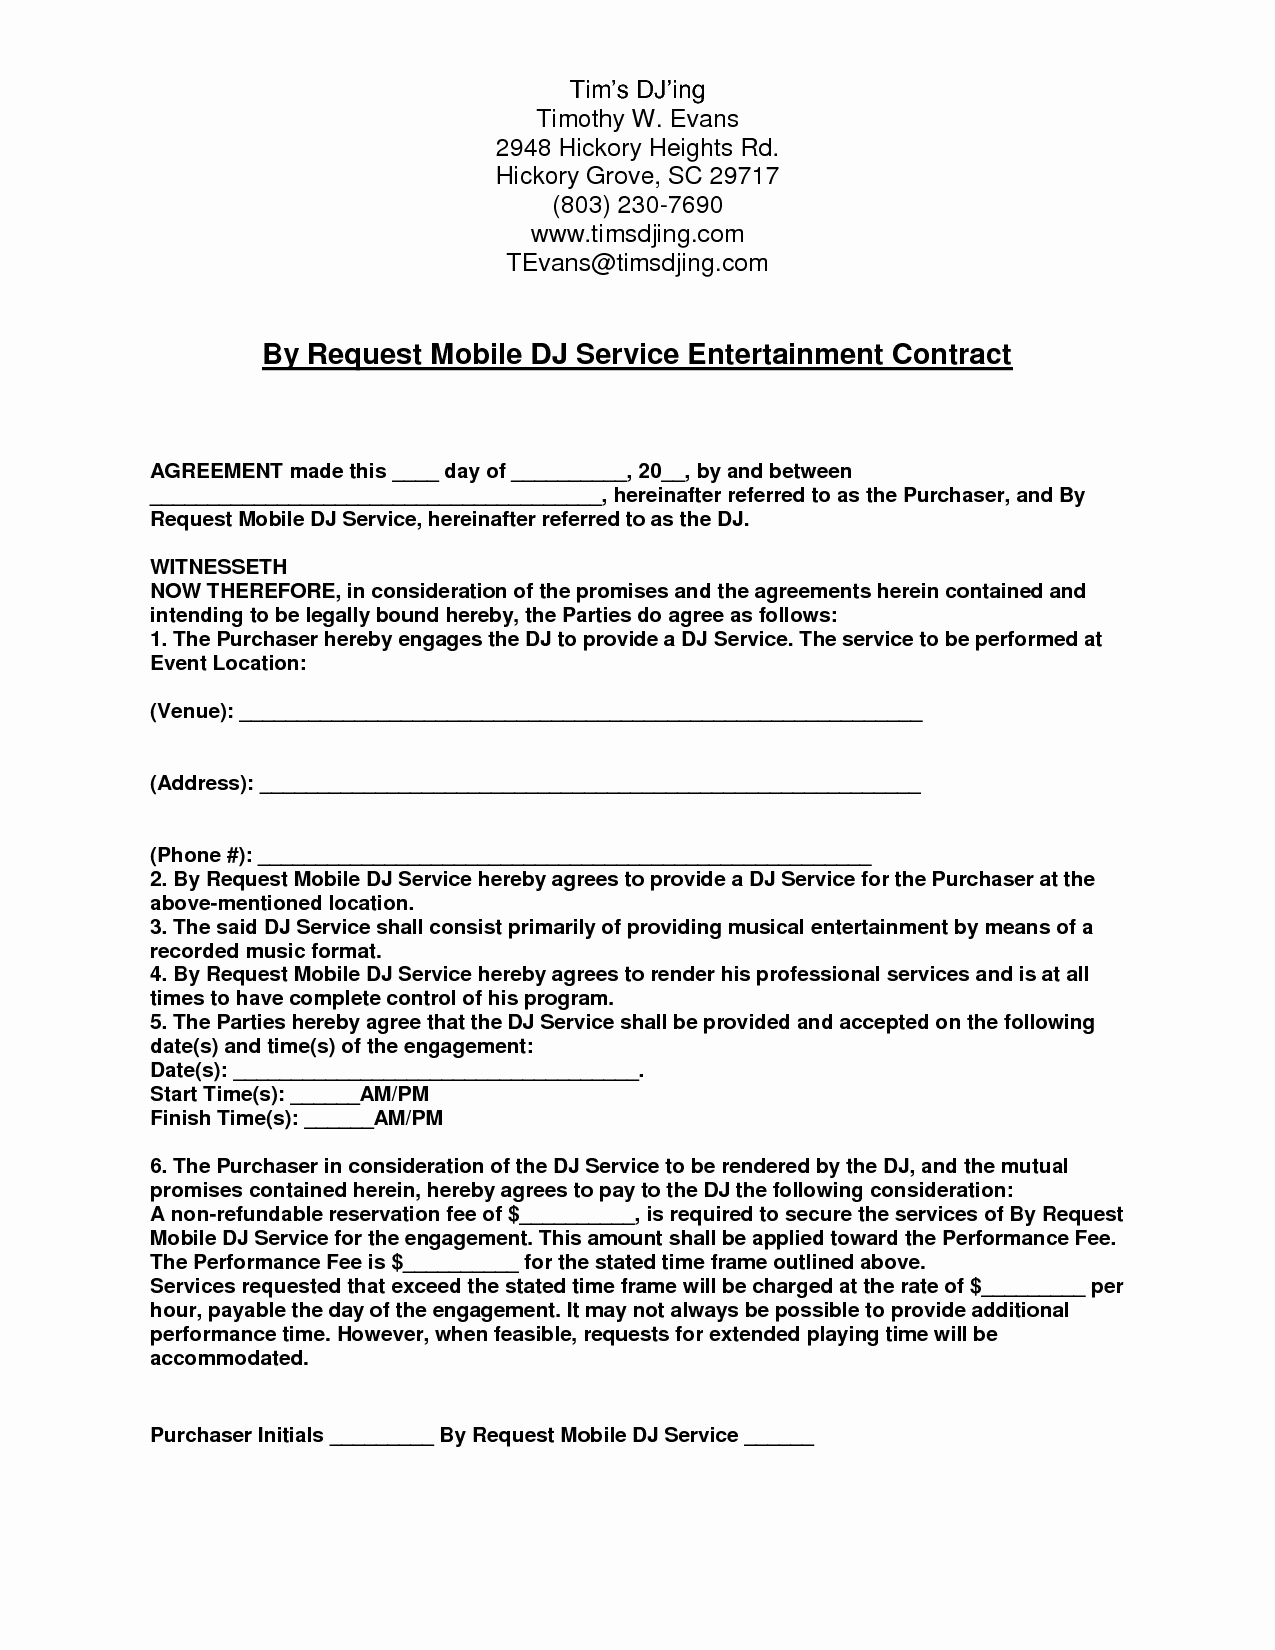 Contract for Dj Services Elegant Mobile Dj Contract by Request Mobile Dj Service Entertainment Contract Pdf Pdf